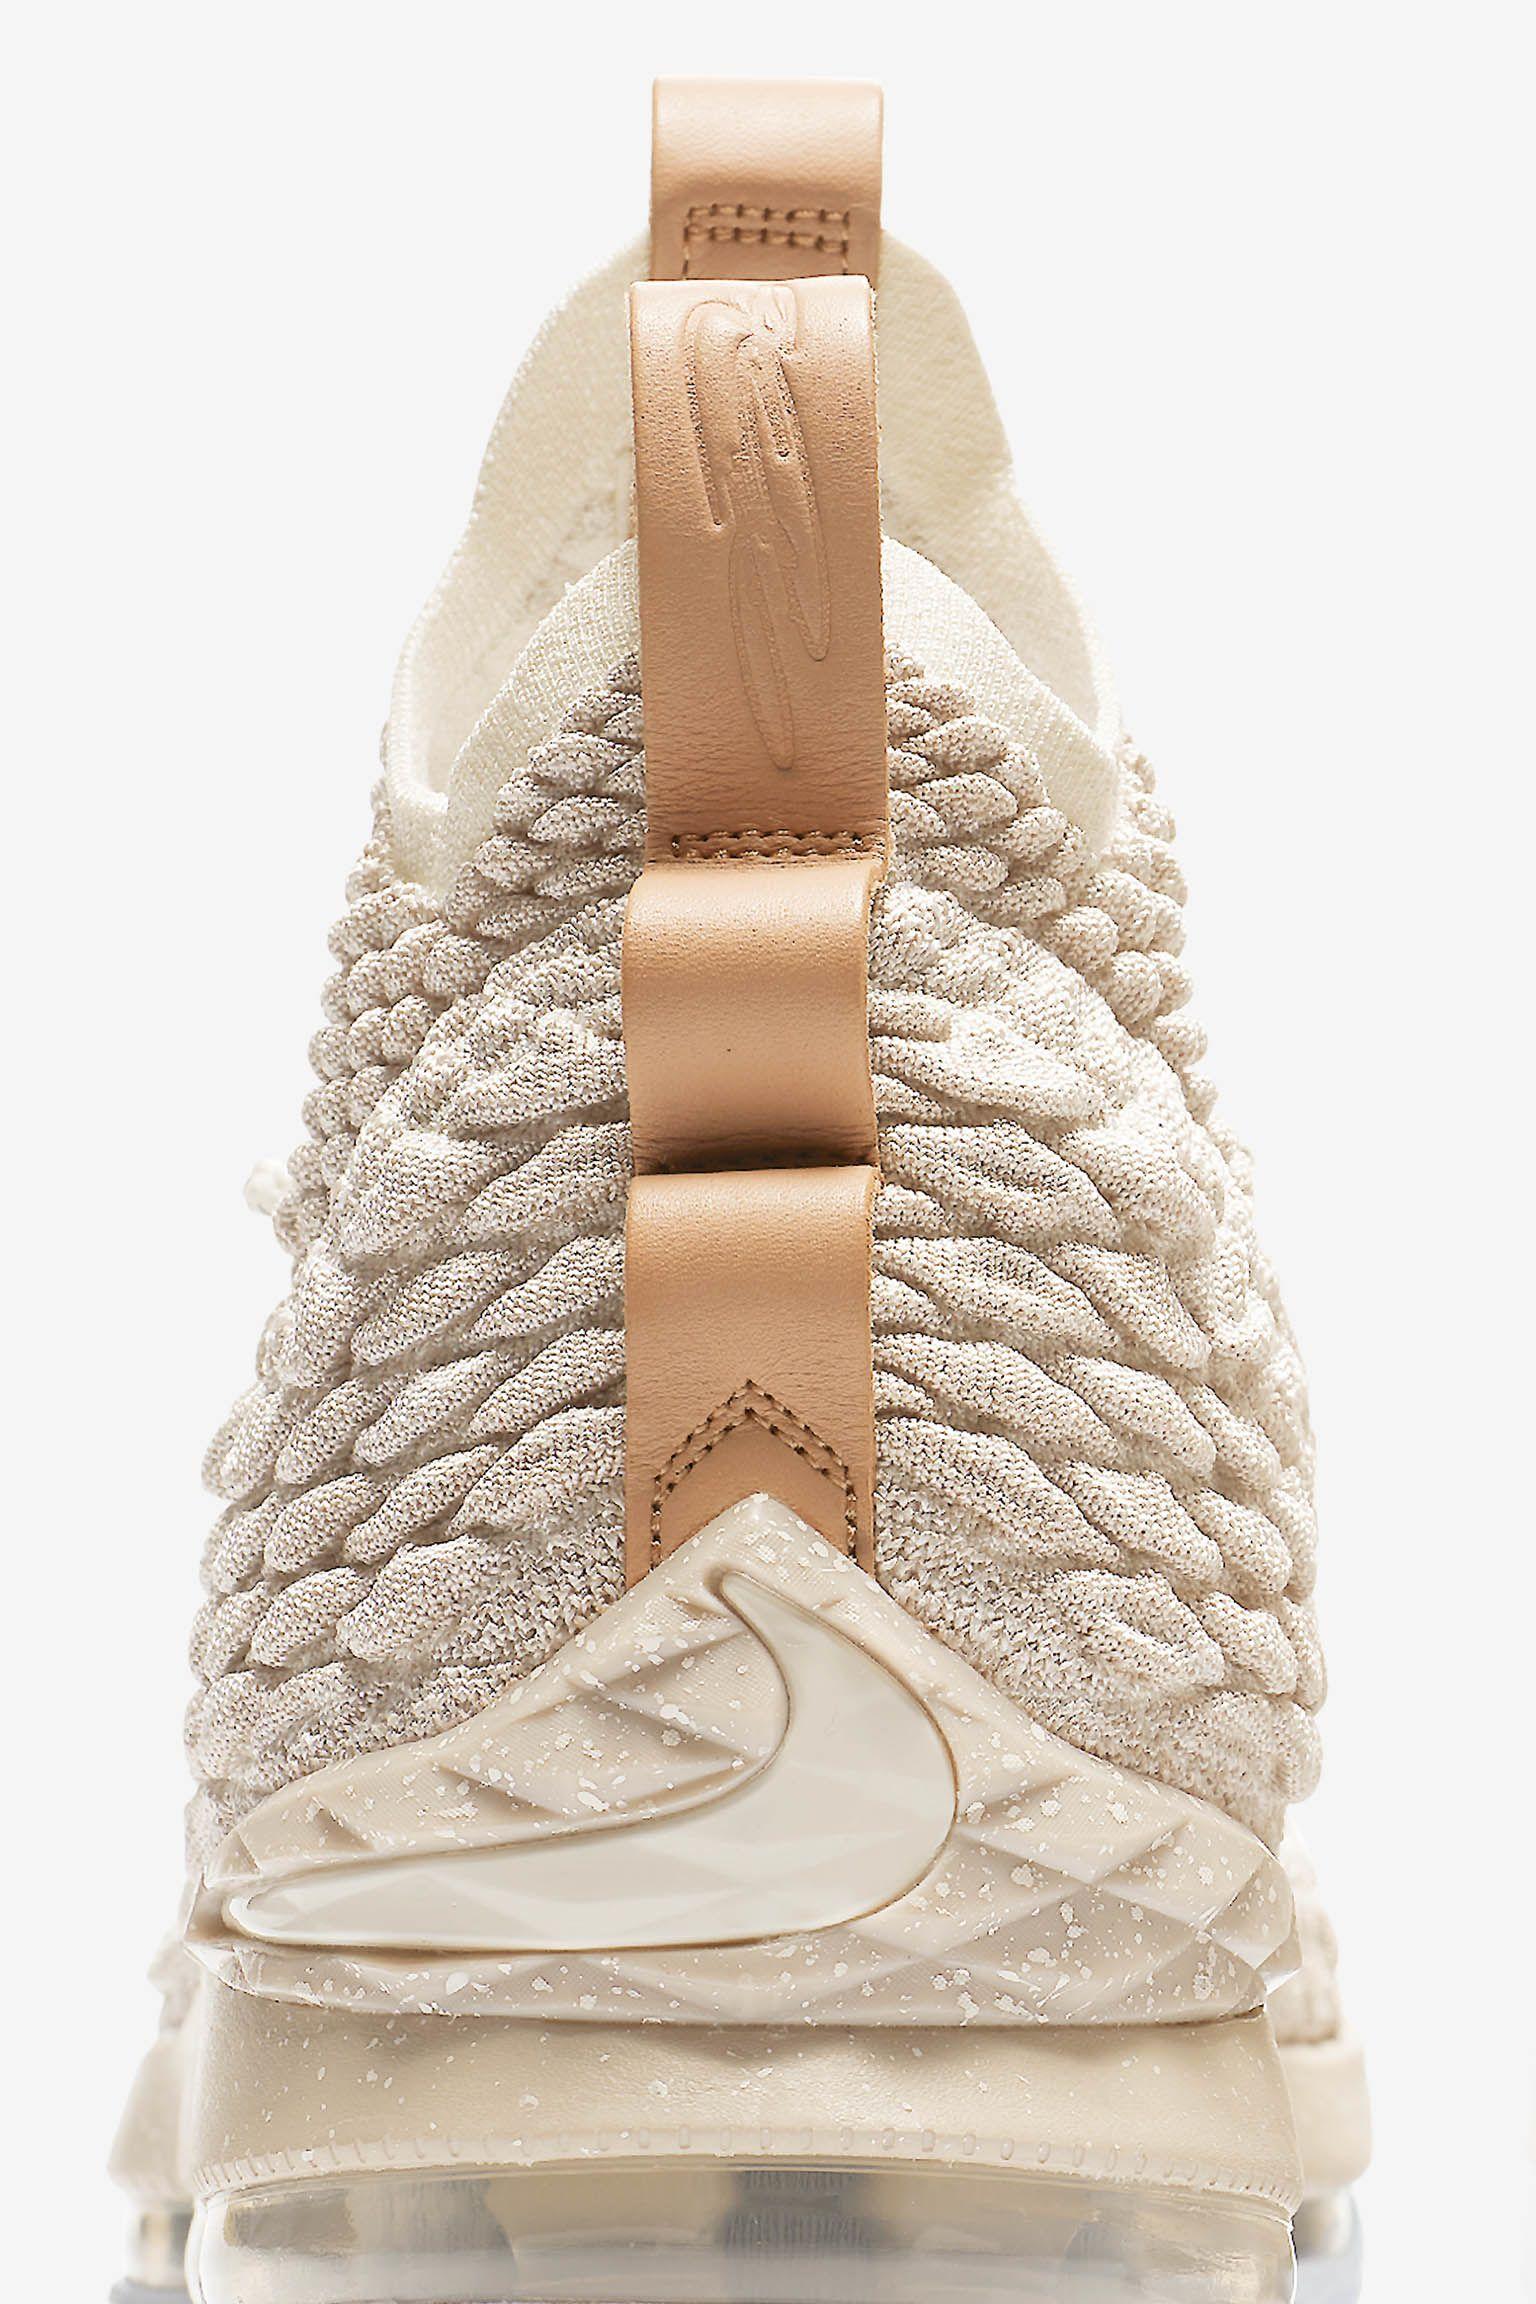 Nike Lebron 15 'Ghost' Release Date